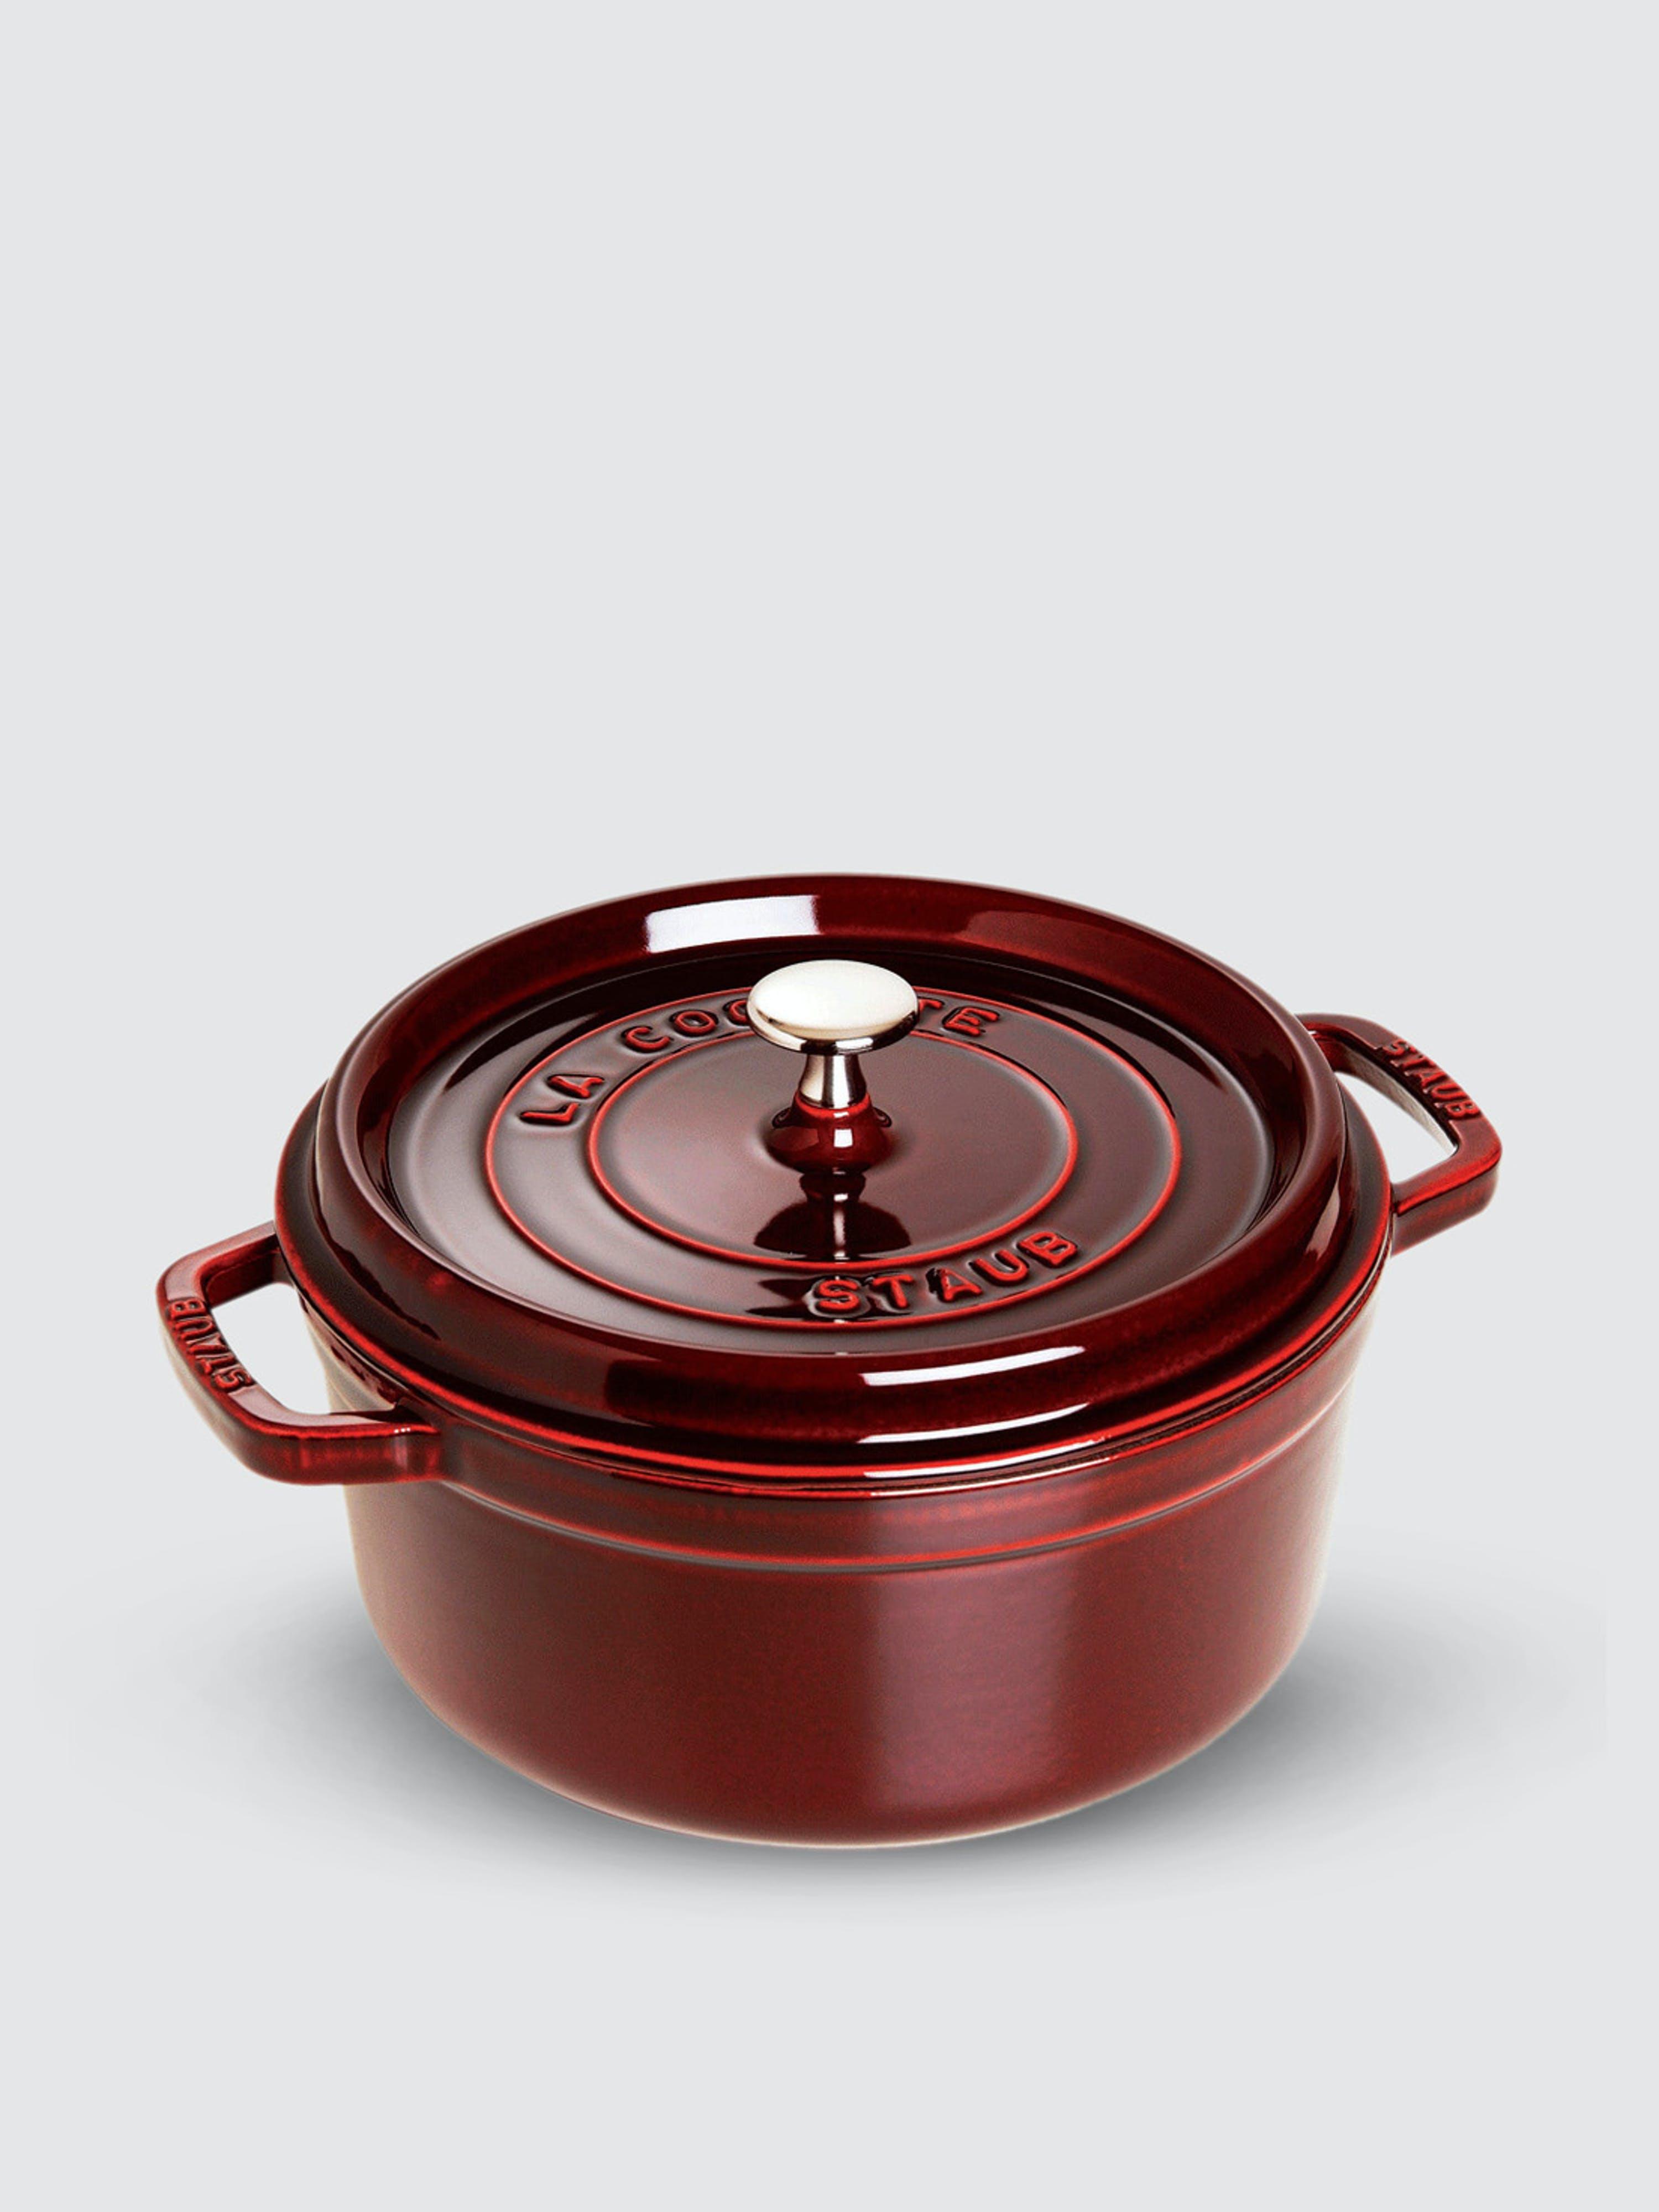 Staub - Verified Partner 2.75-Qt Round Cocotte  - Red